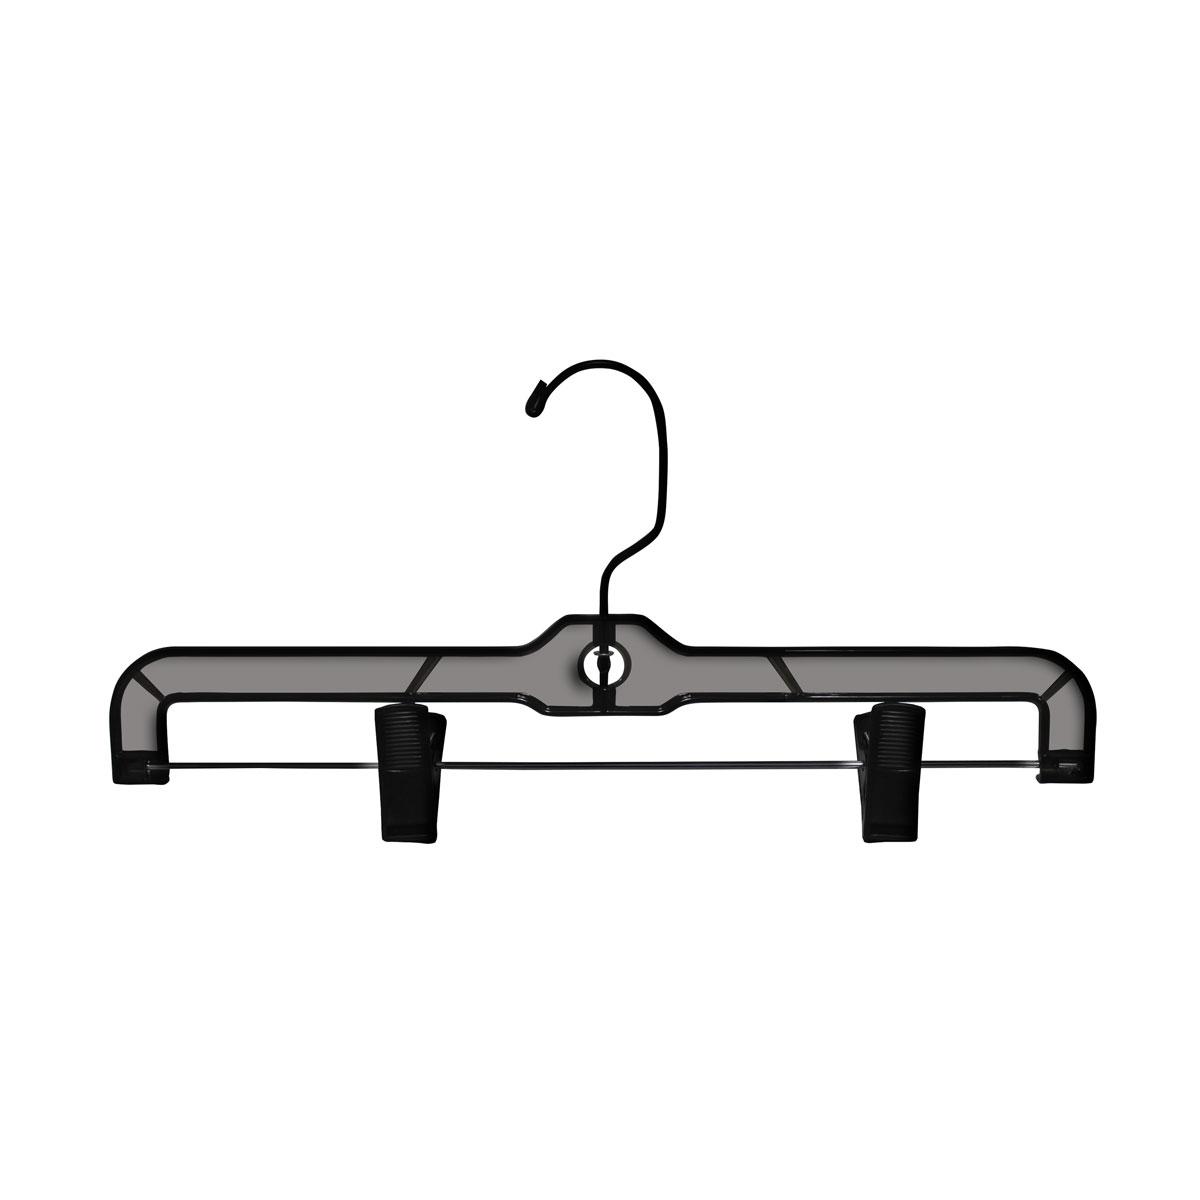 14″ Heavy Weight Pant & Skirt Hanger